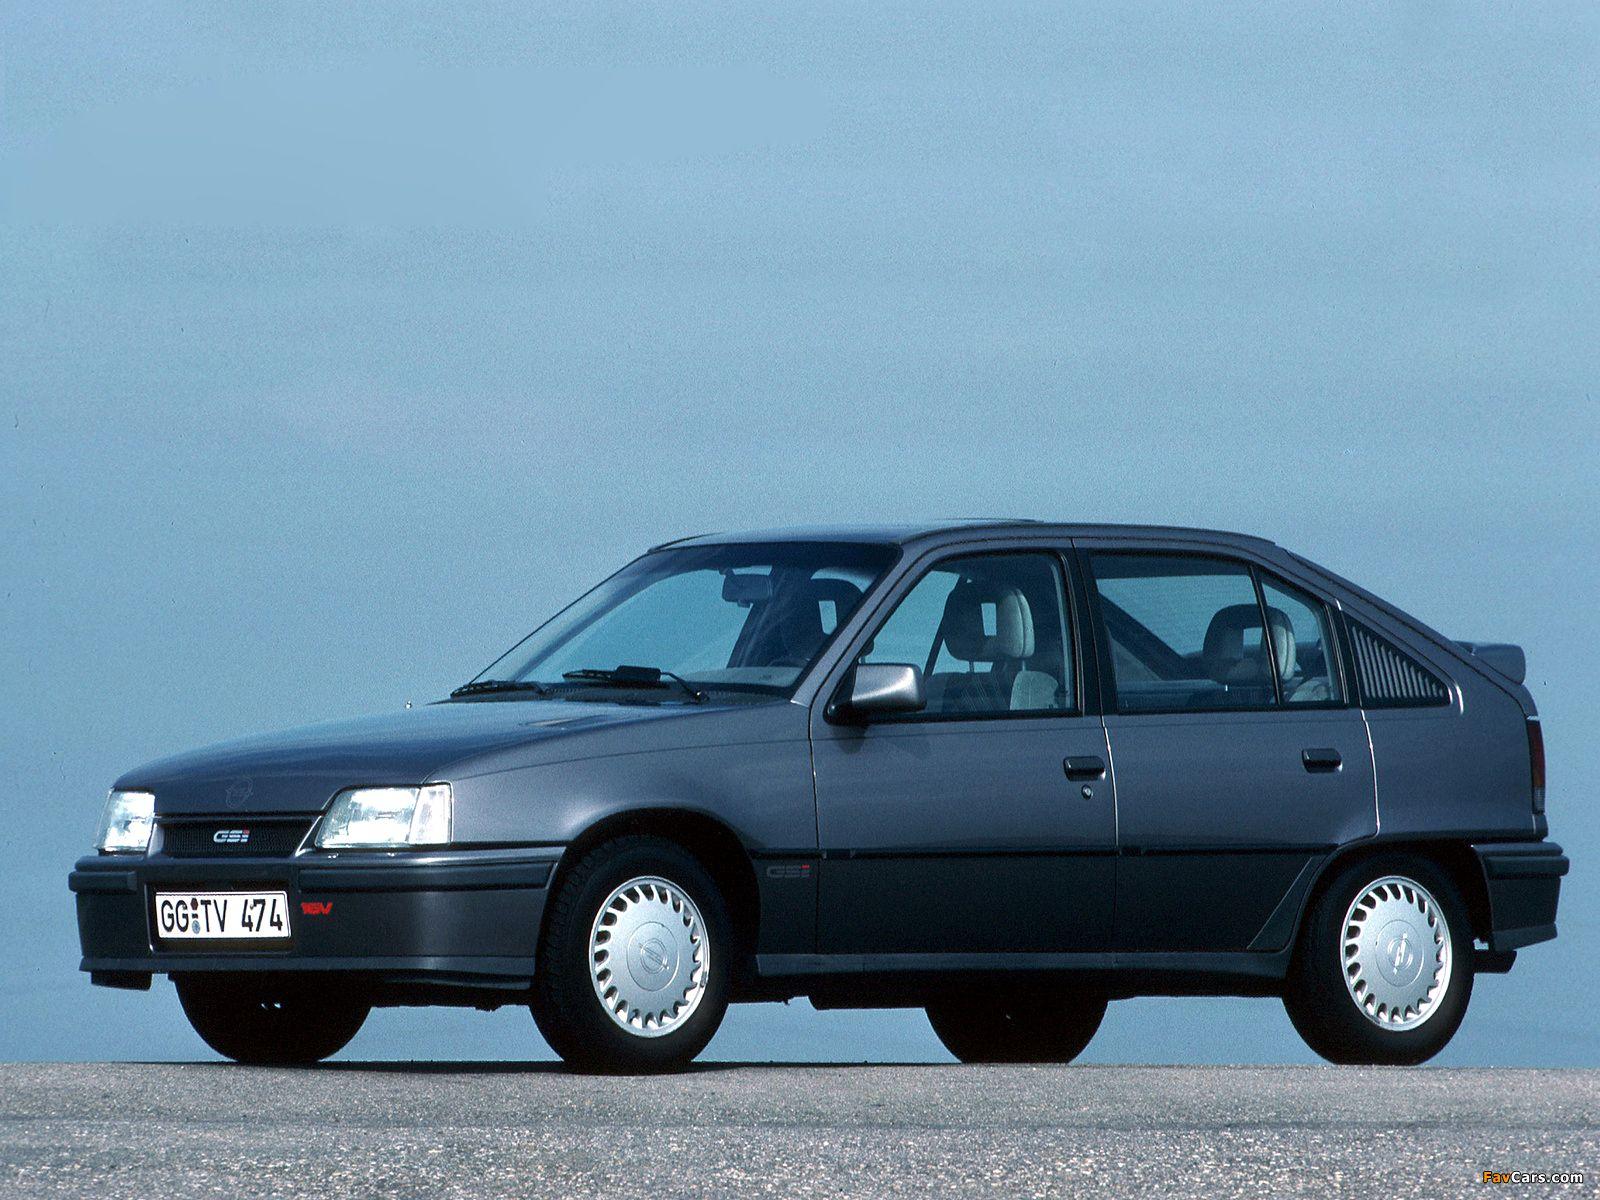 1988 Opel Kadett E Gsi 16v